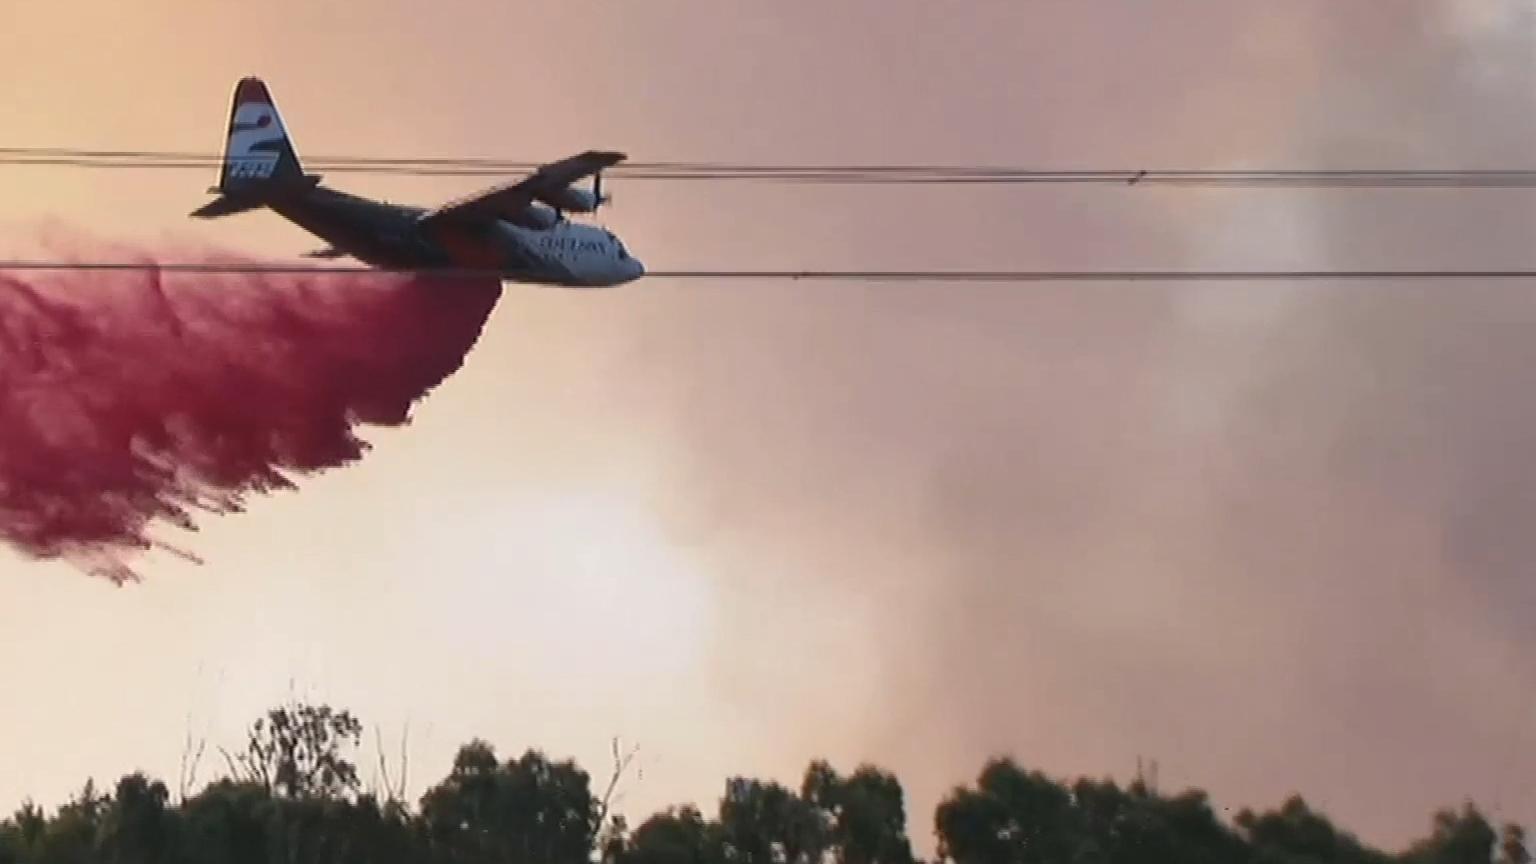 Southern properties ravaged by bushfire